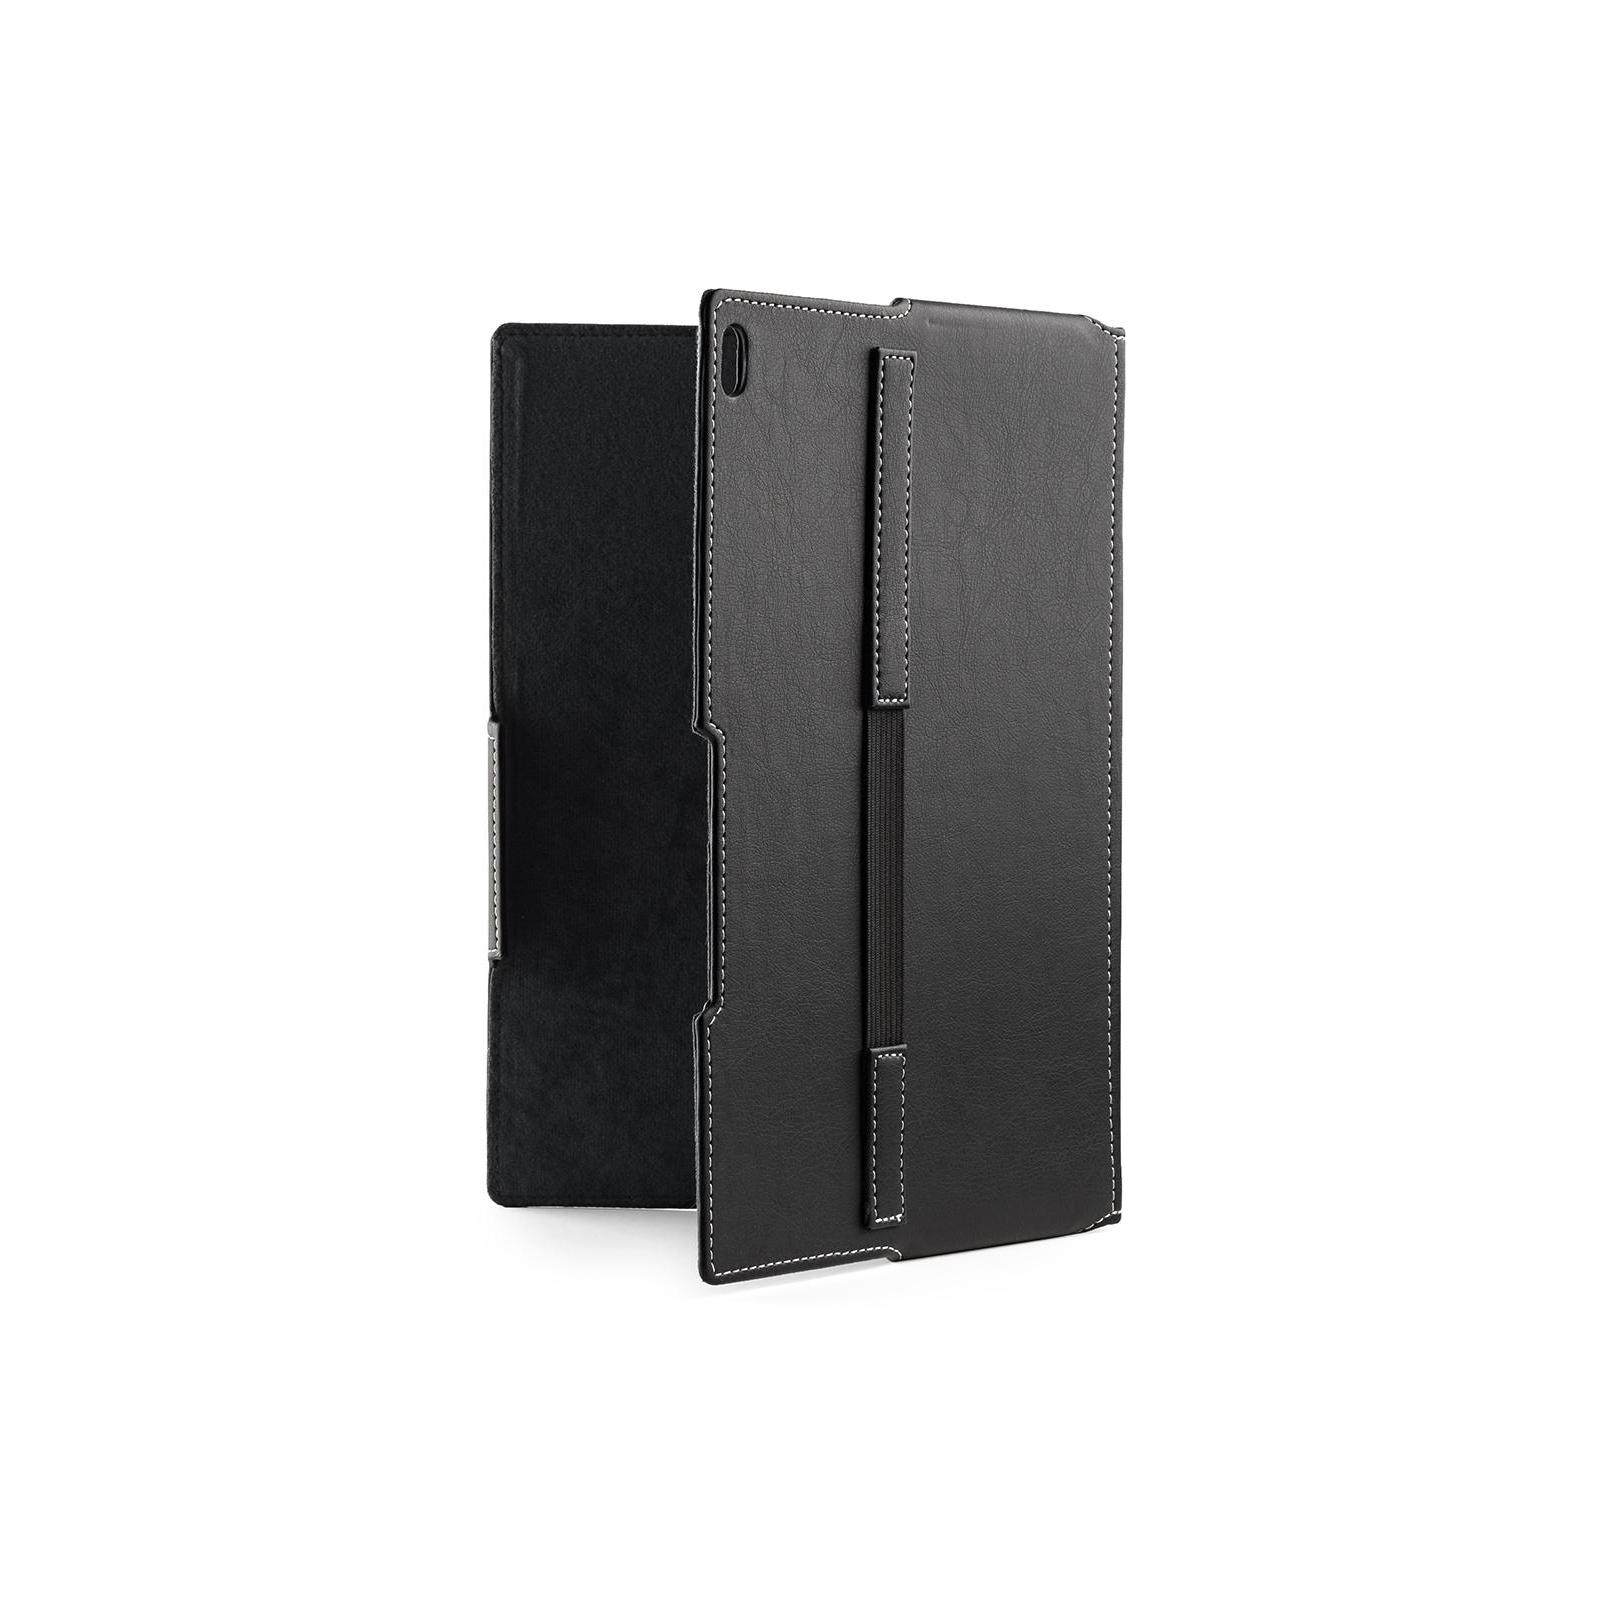 Чехол для планшета Lenovo Tab 4 10 LTE black Vinga (VNTB10LTE) изображение 2